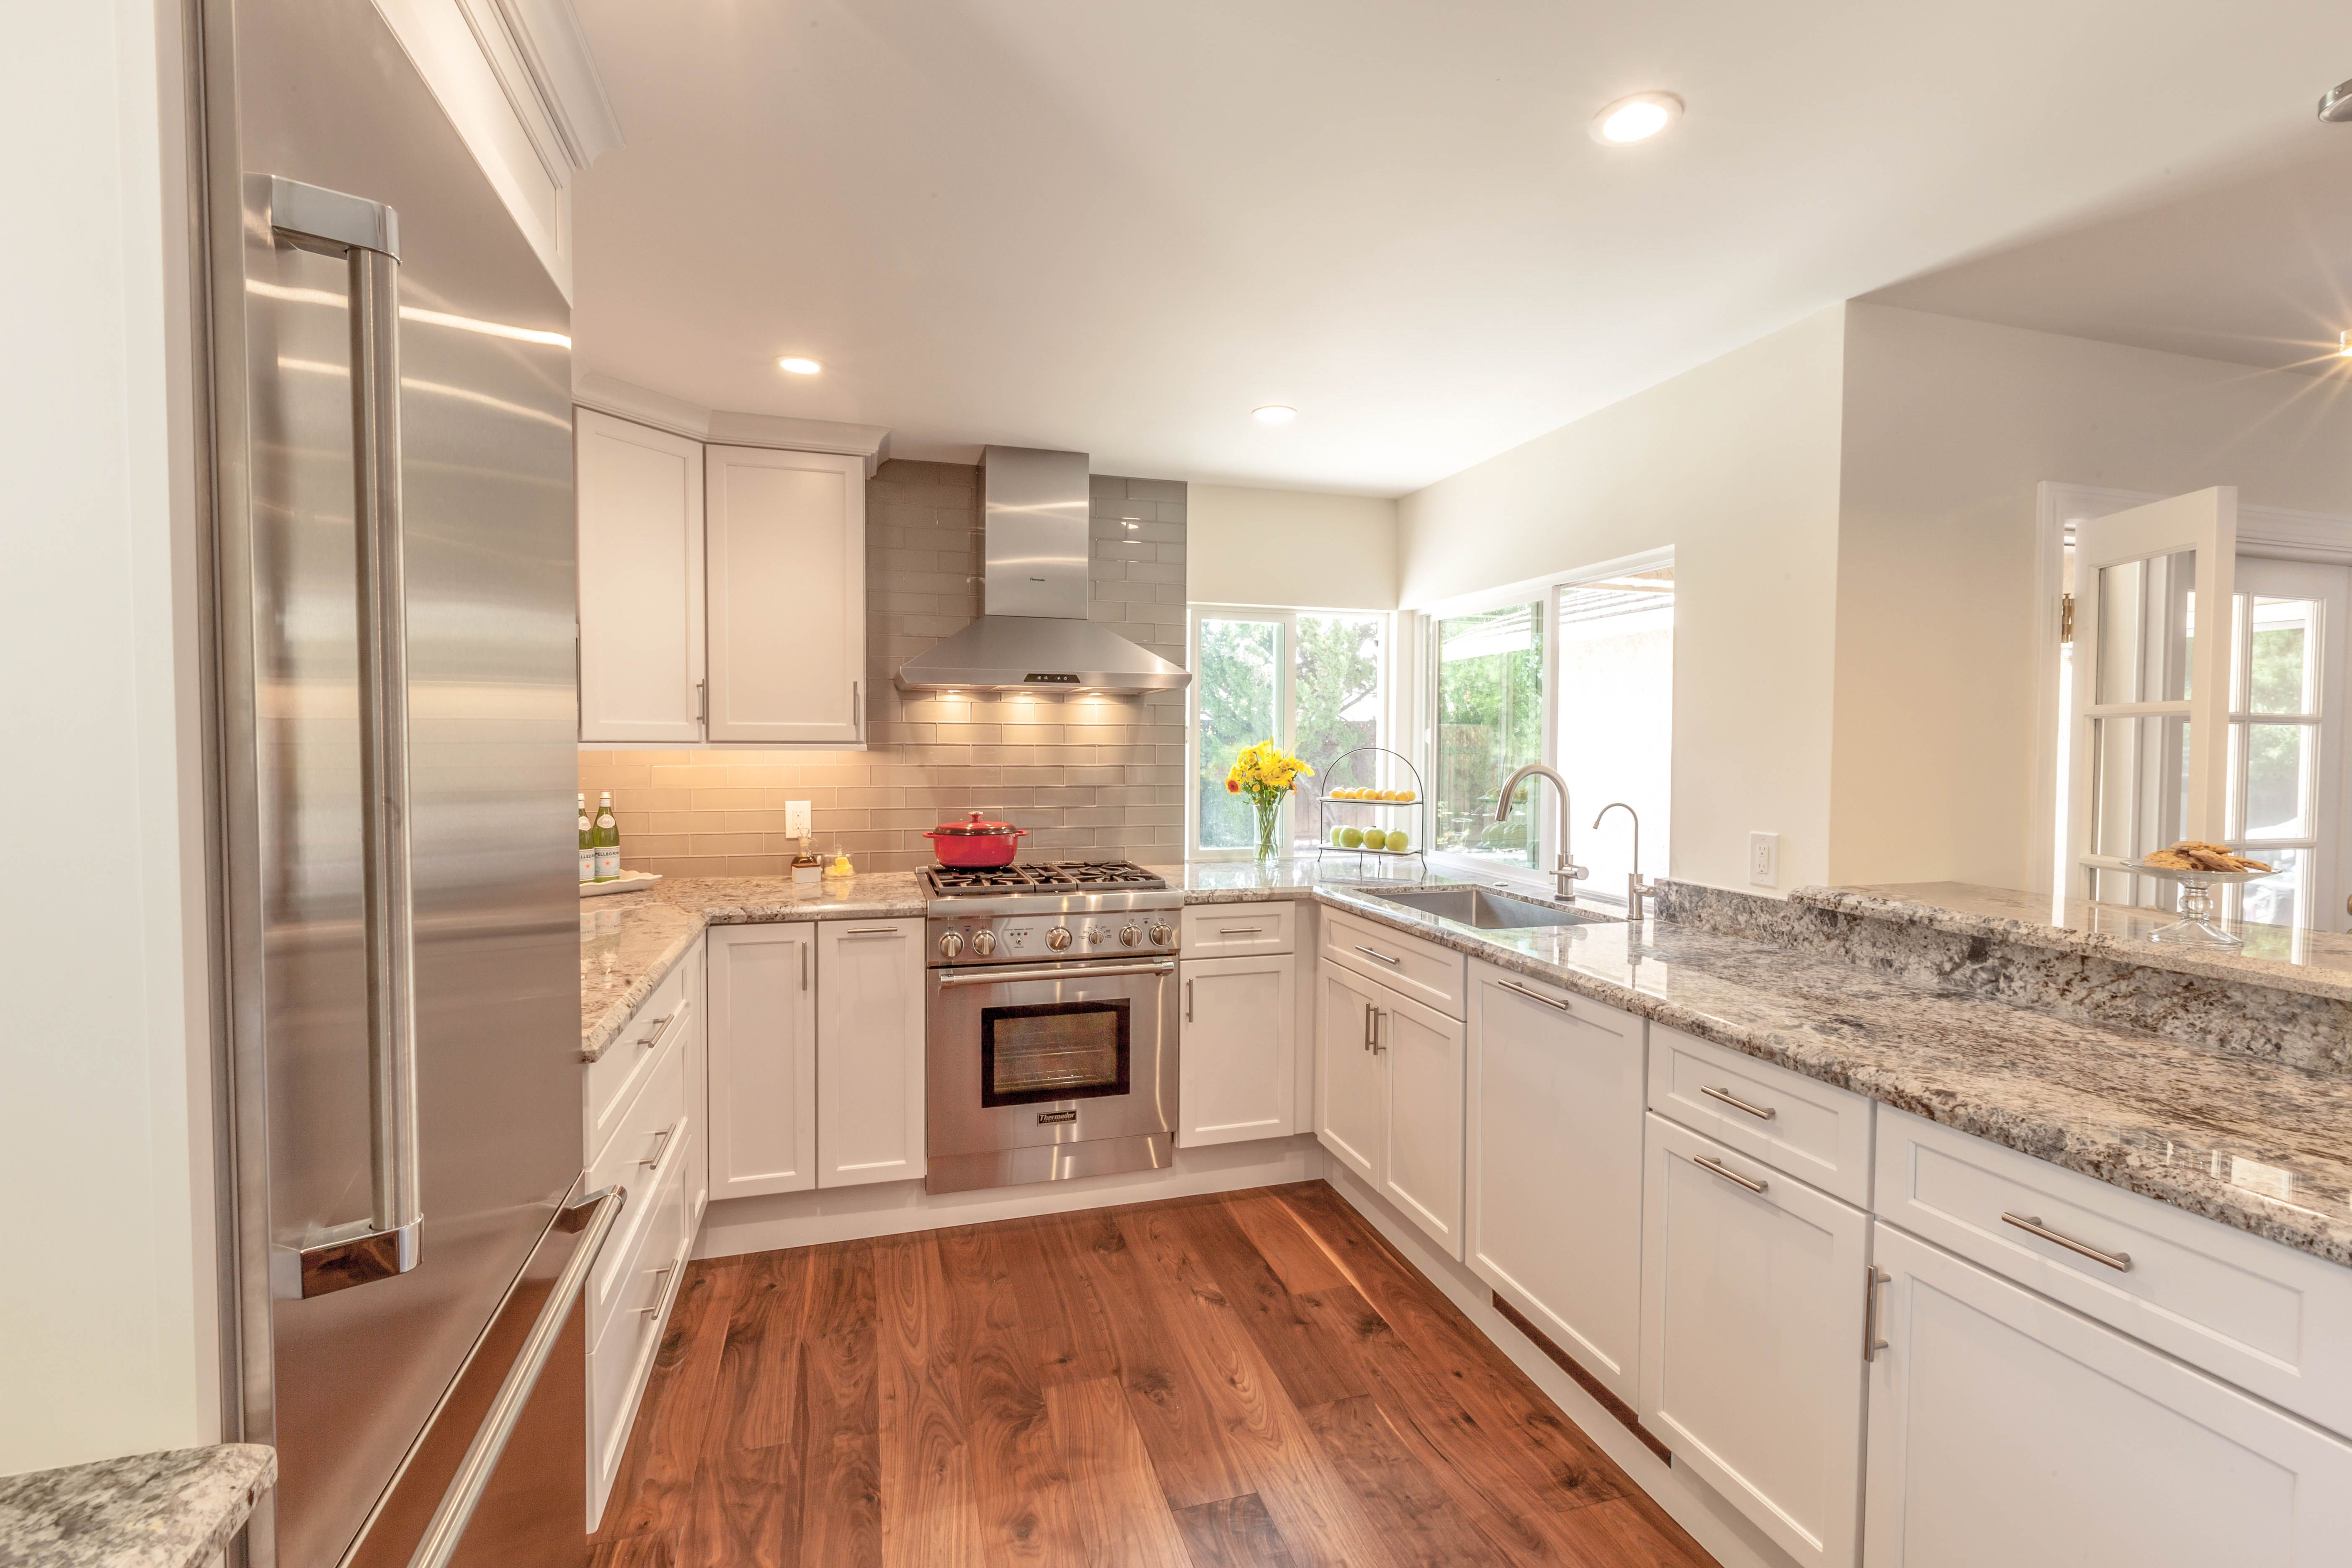 Baschwarz Com Kitchen Renovation In San Jose Ca Kitchen Renovation Kitchen Beautiful Interiors